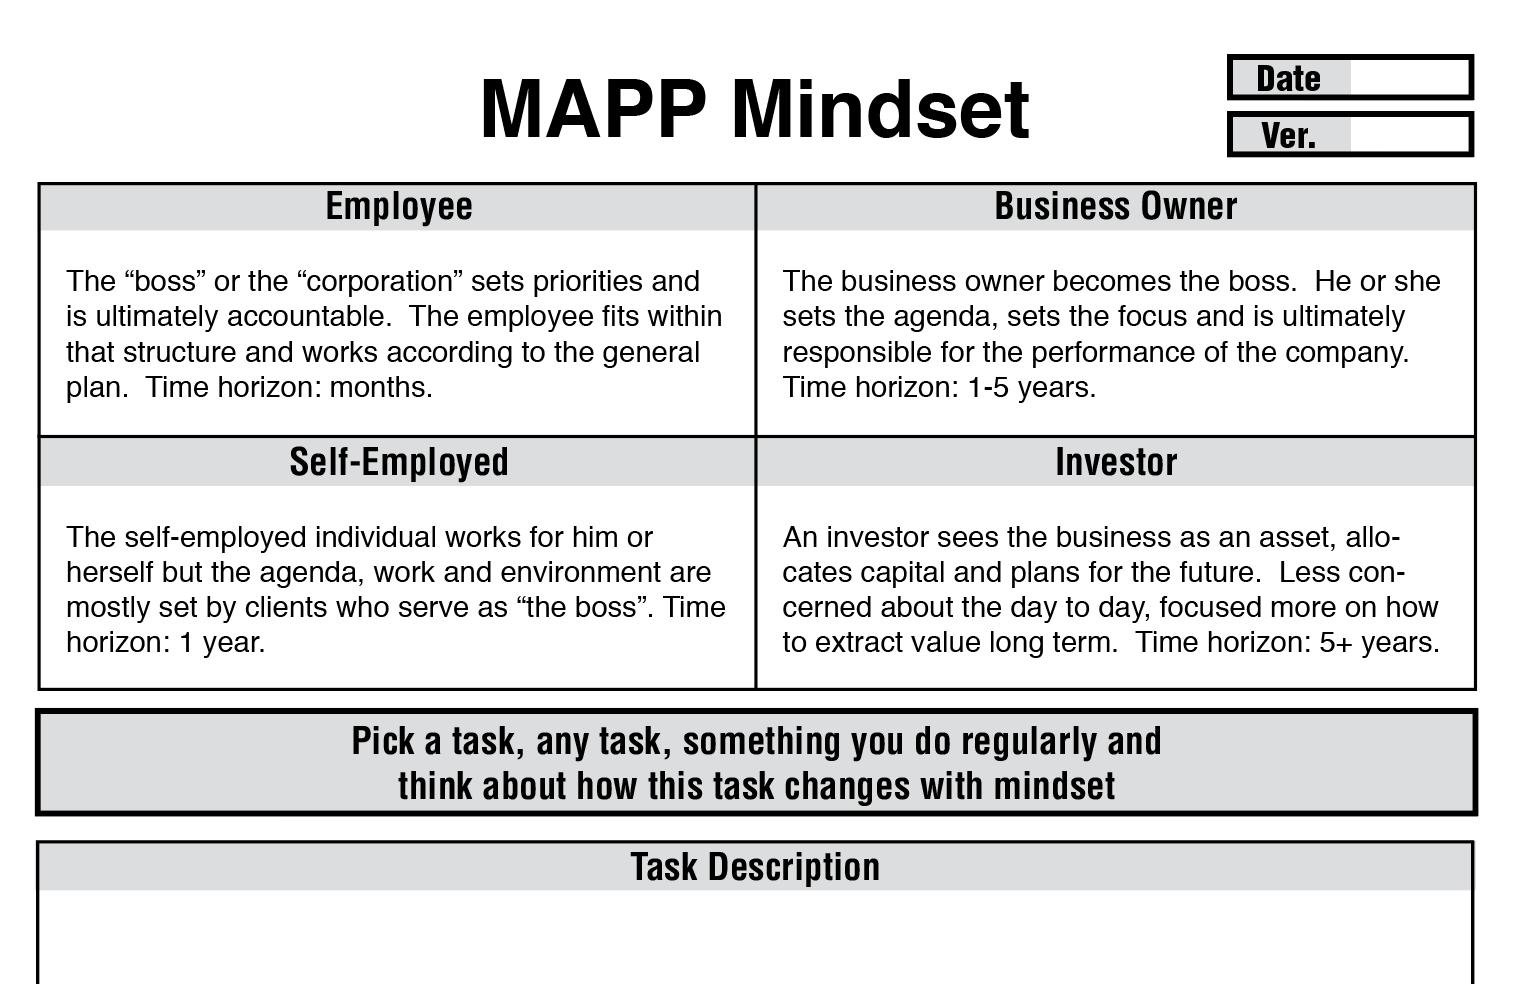 Download theMAPP Mindset Tool -